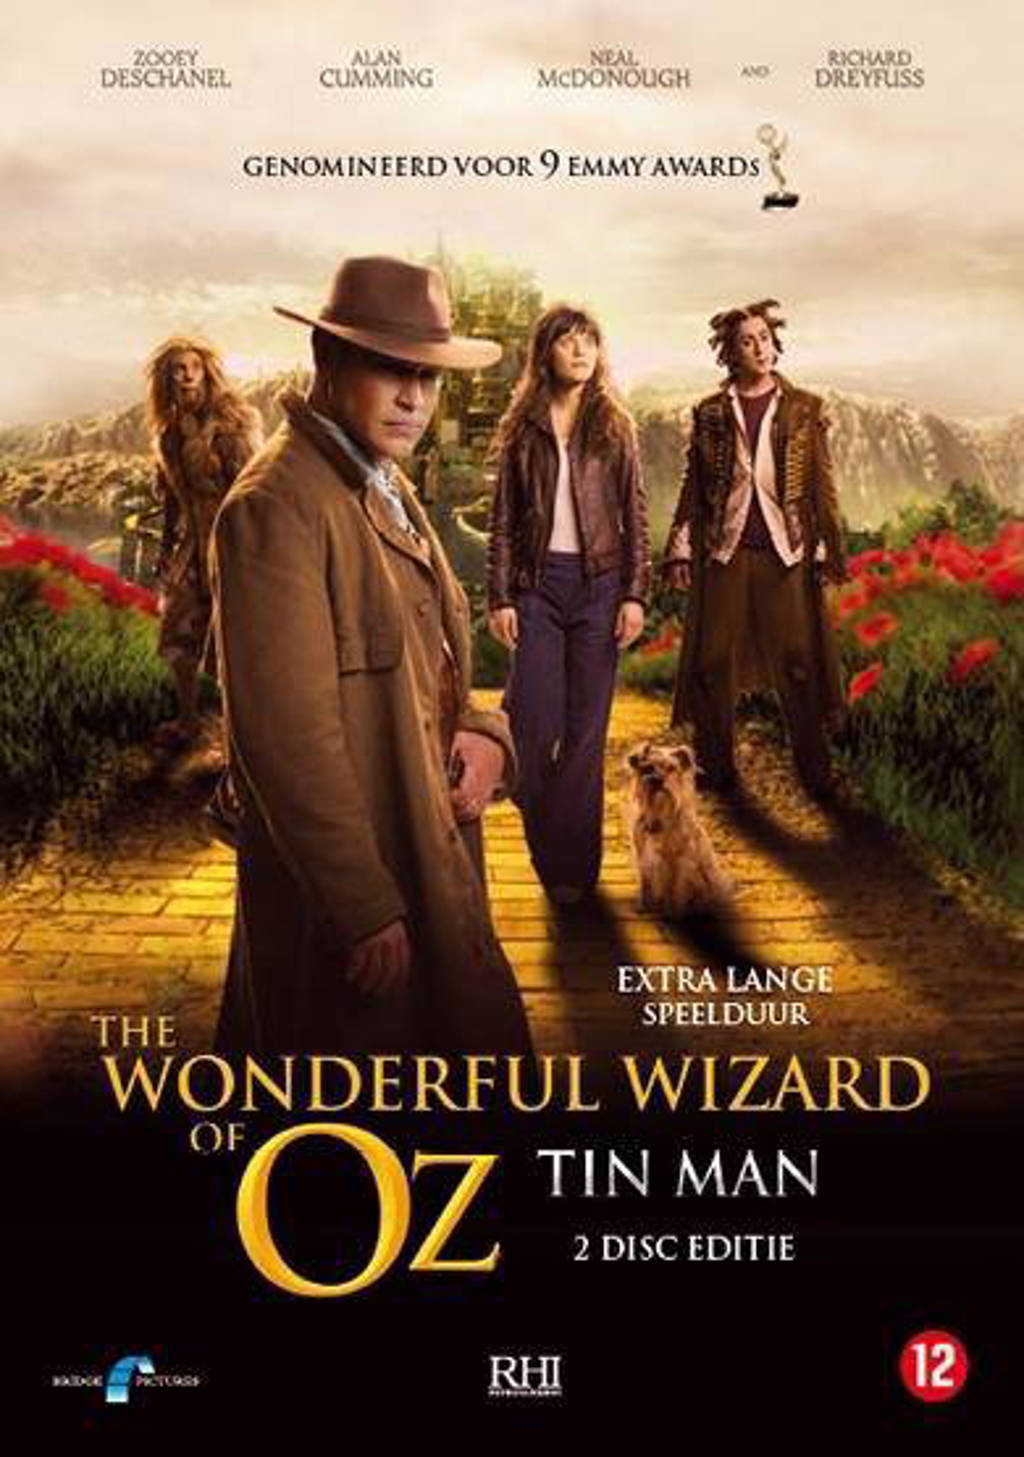 Wonderful wizard of Oz - tin man (DVD)